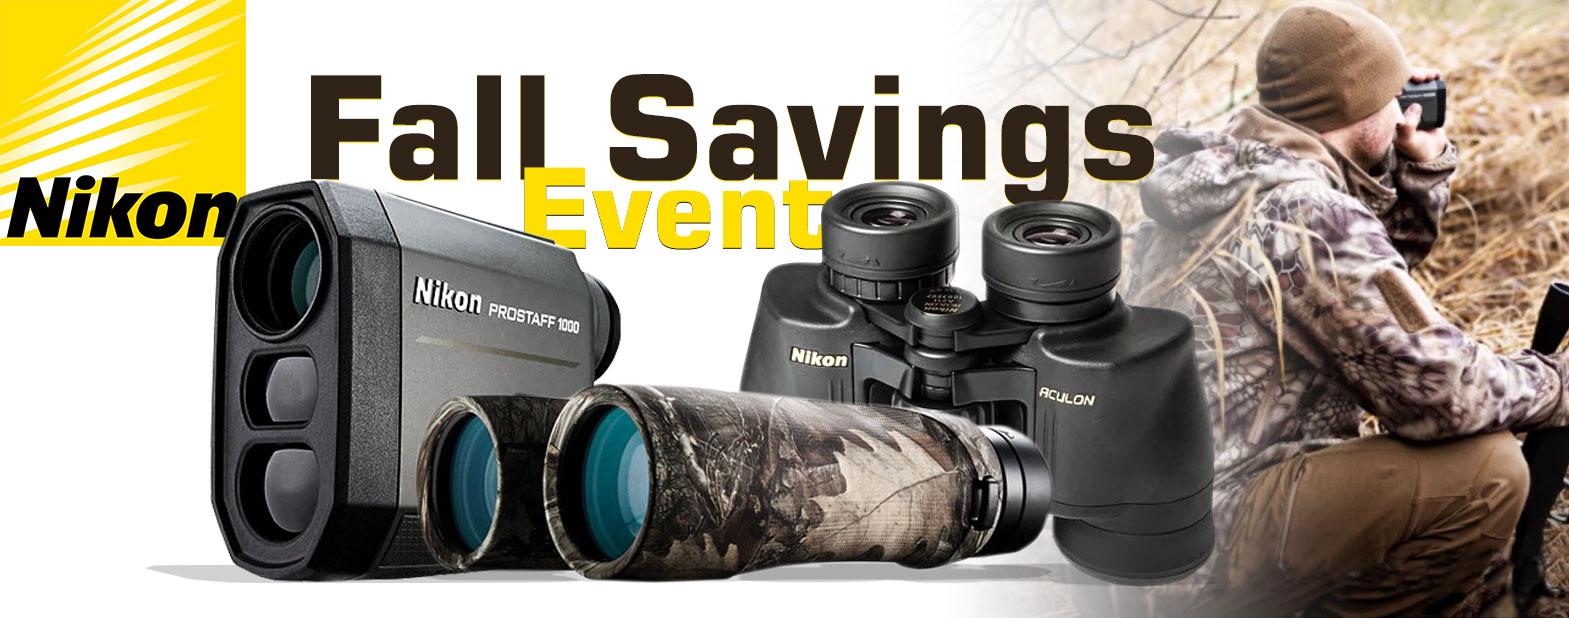 fall-savings-event-gs-rebate.jpg